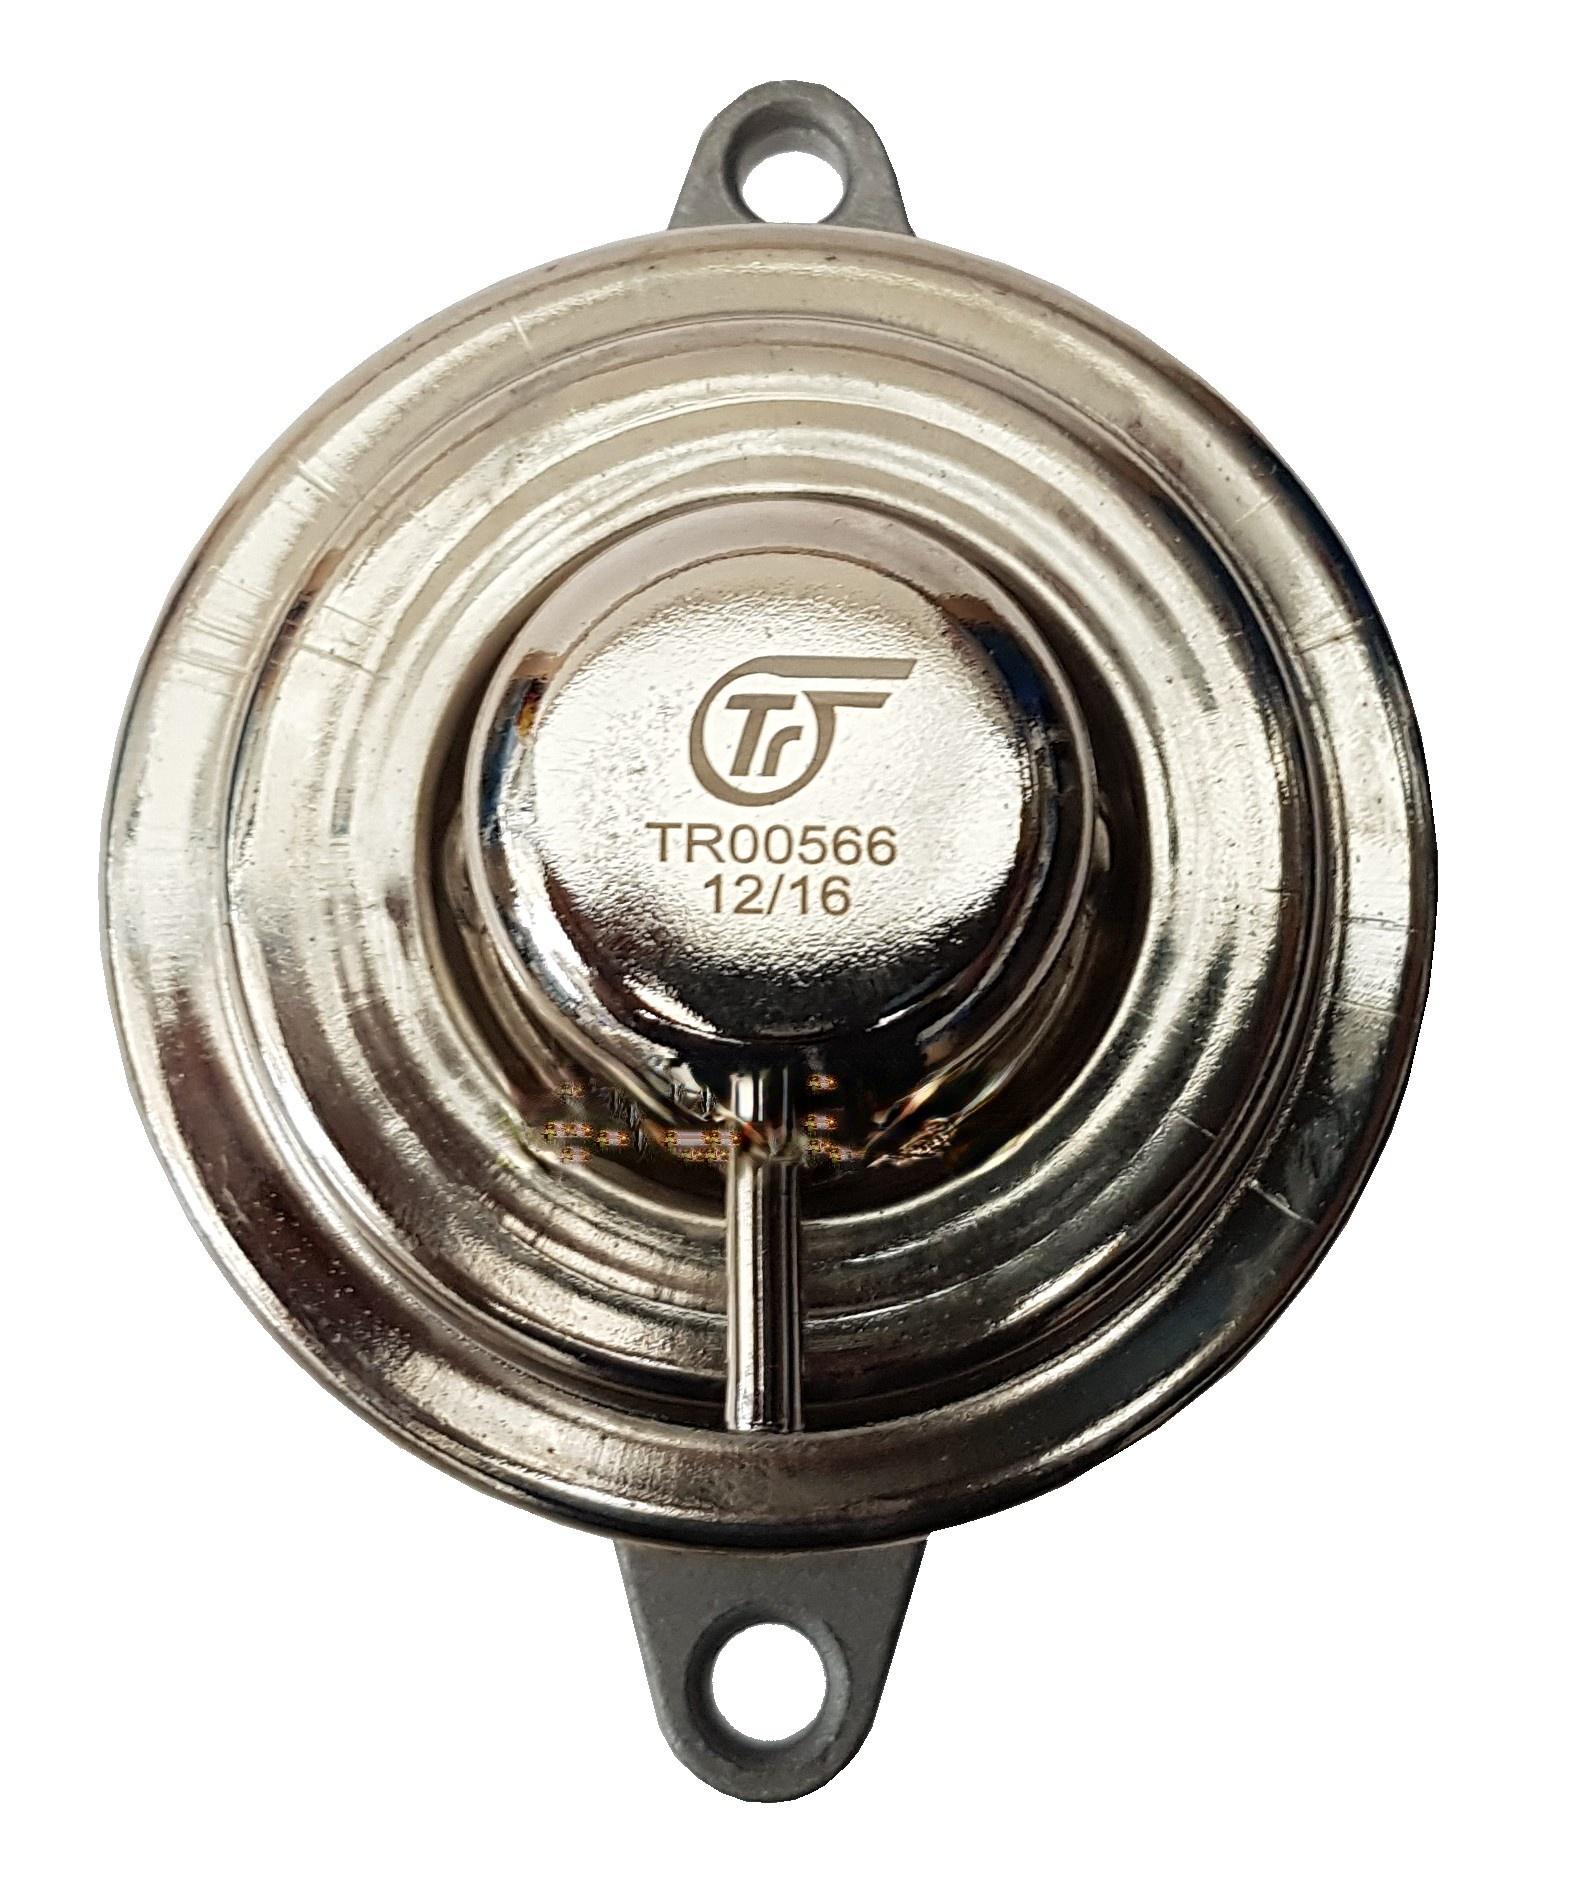 EGR ventil - TR00566 Opel Astra 2.0DI Omega Vectra Náhradní díly prémiové kvality